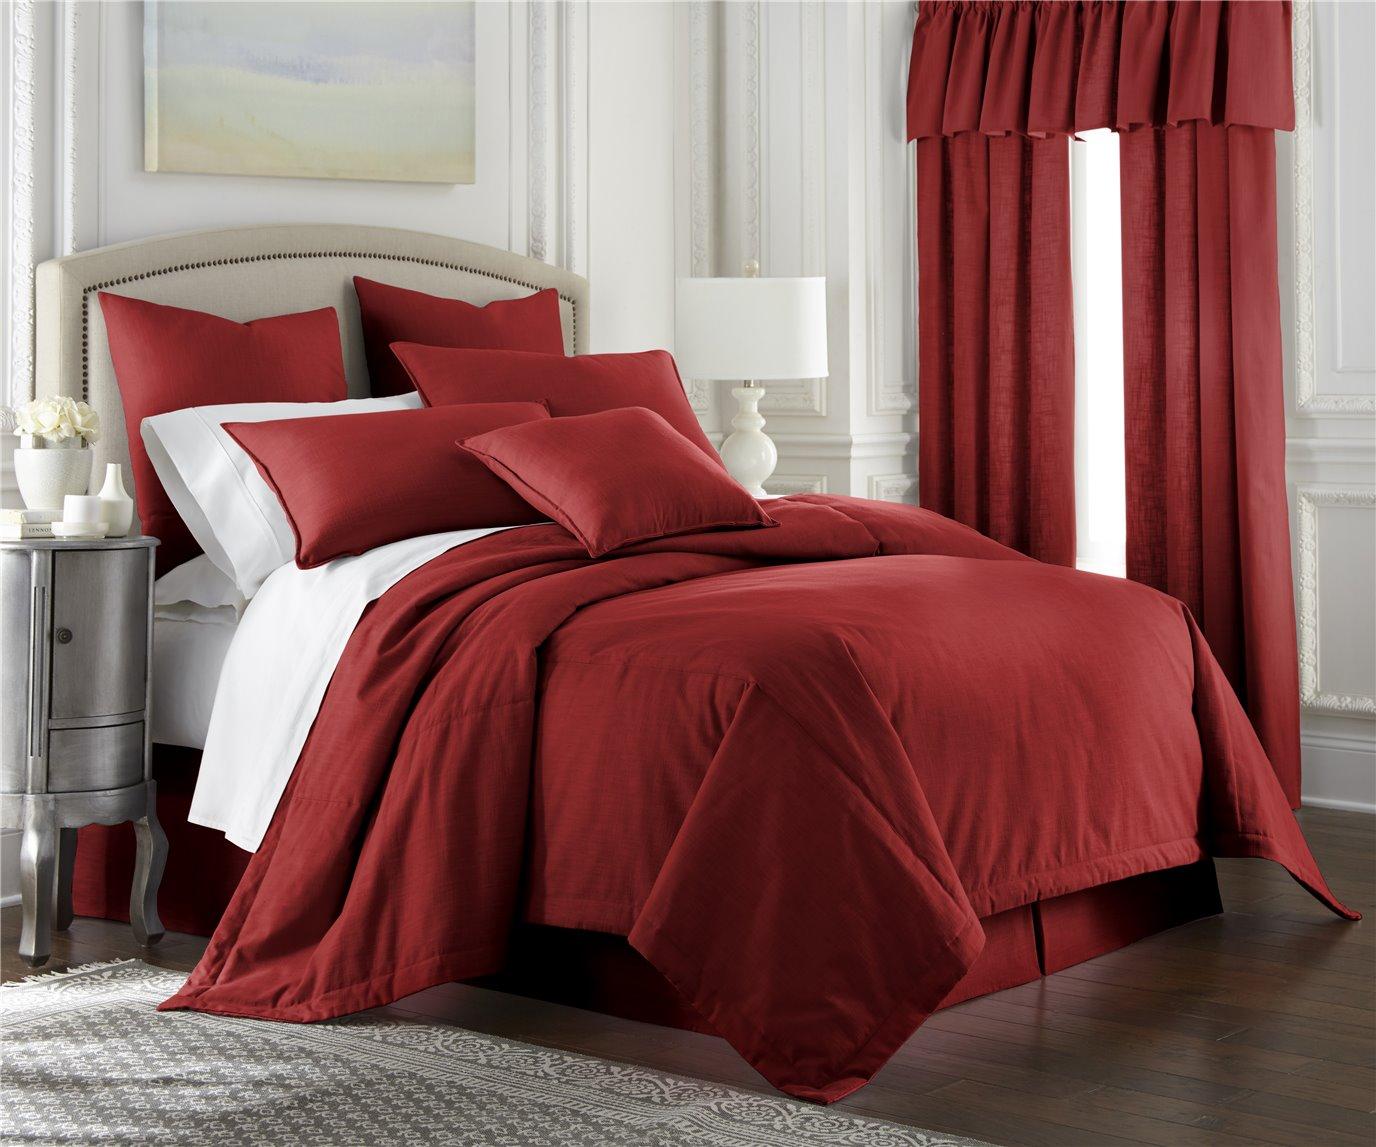 Cambric Red Comforter Queen